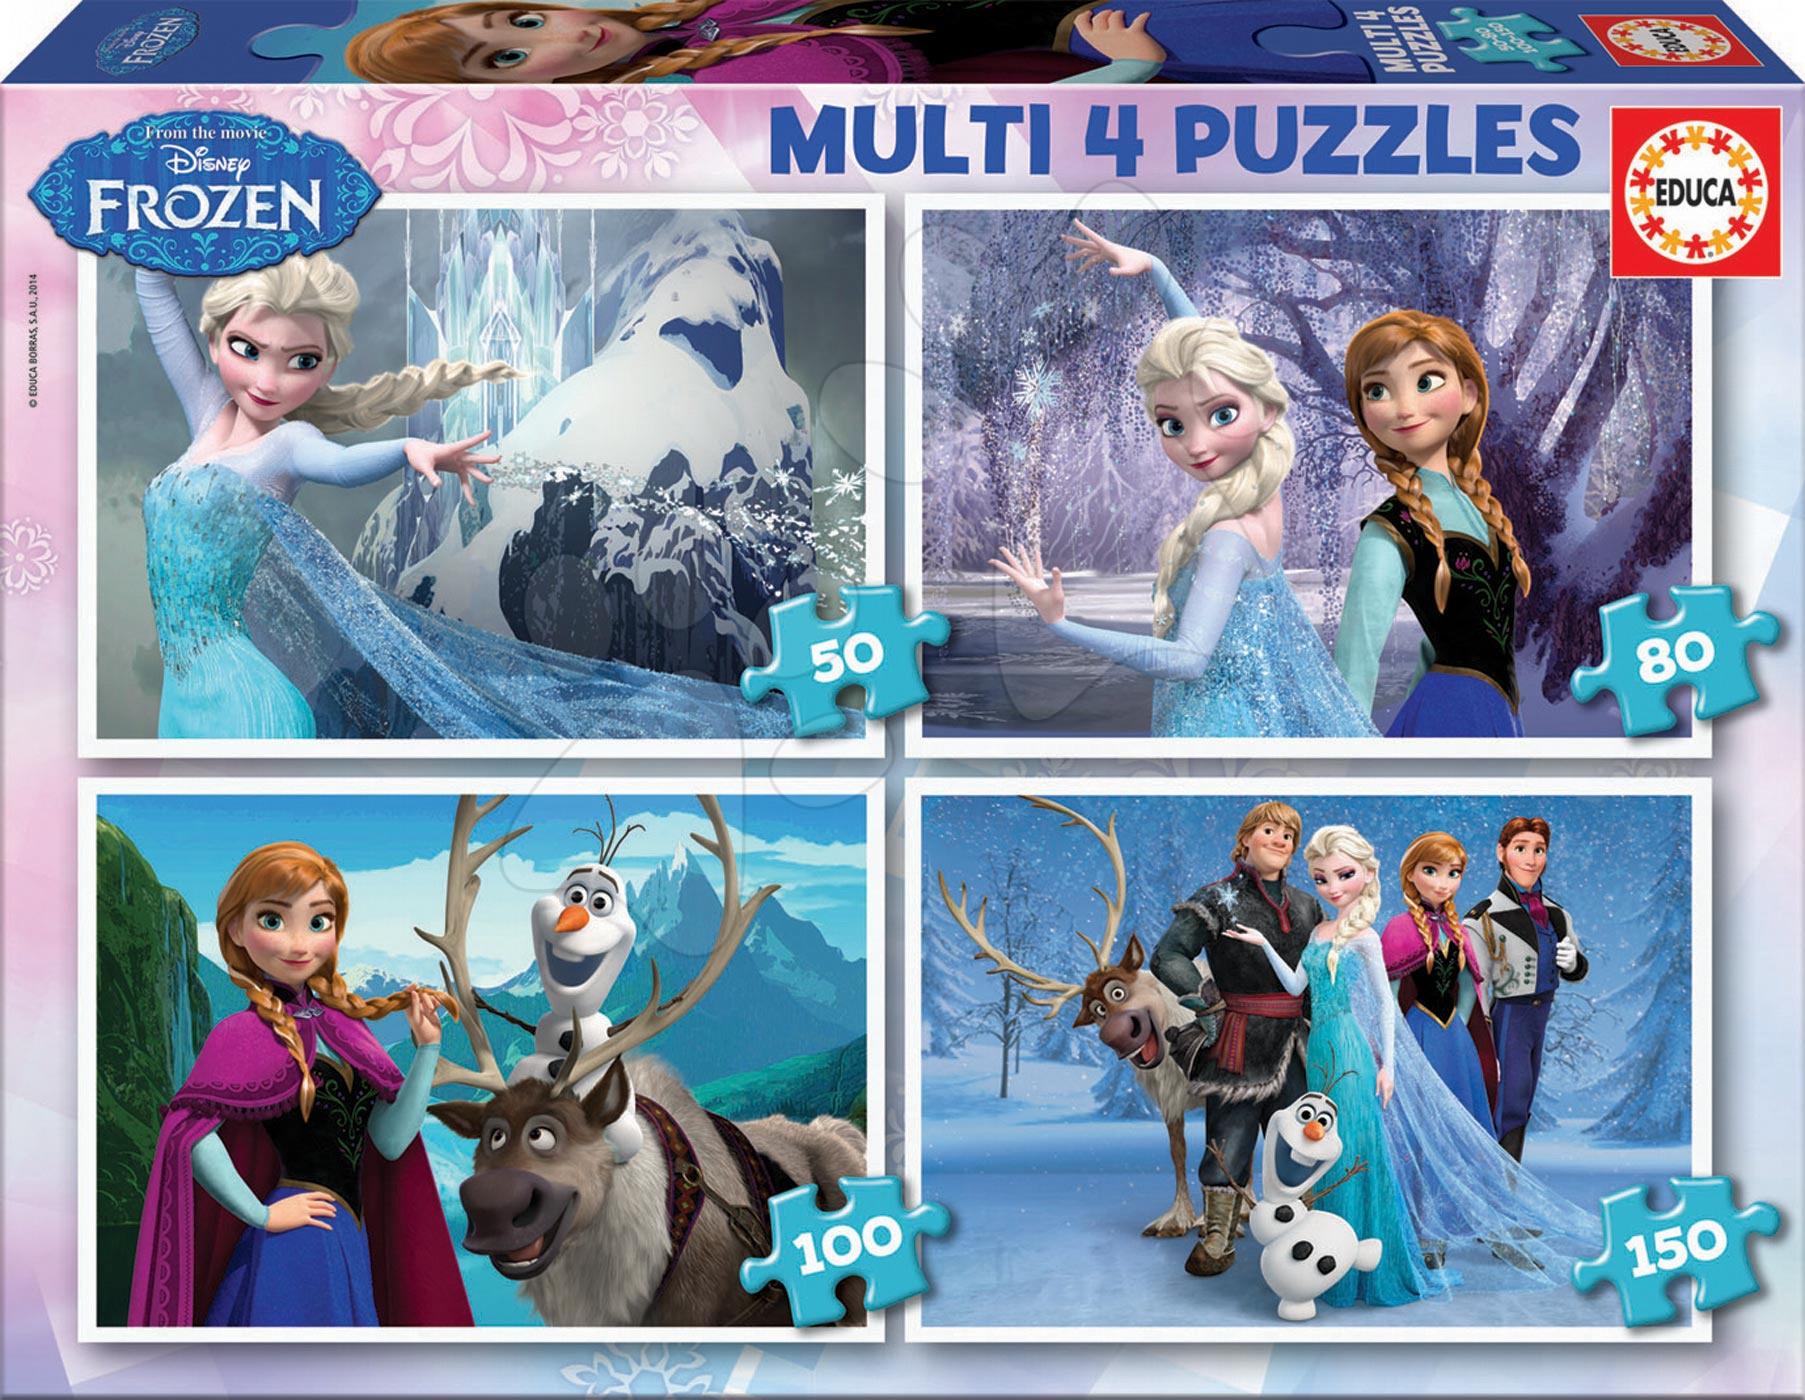 Progresívne detské puzzle - Puzzle Disney Frozen Educa 150-100-80-50 dielov od 5 rokov